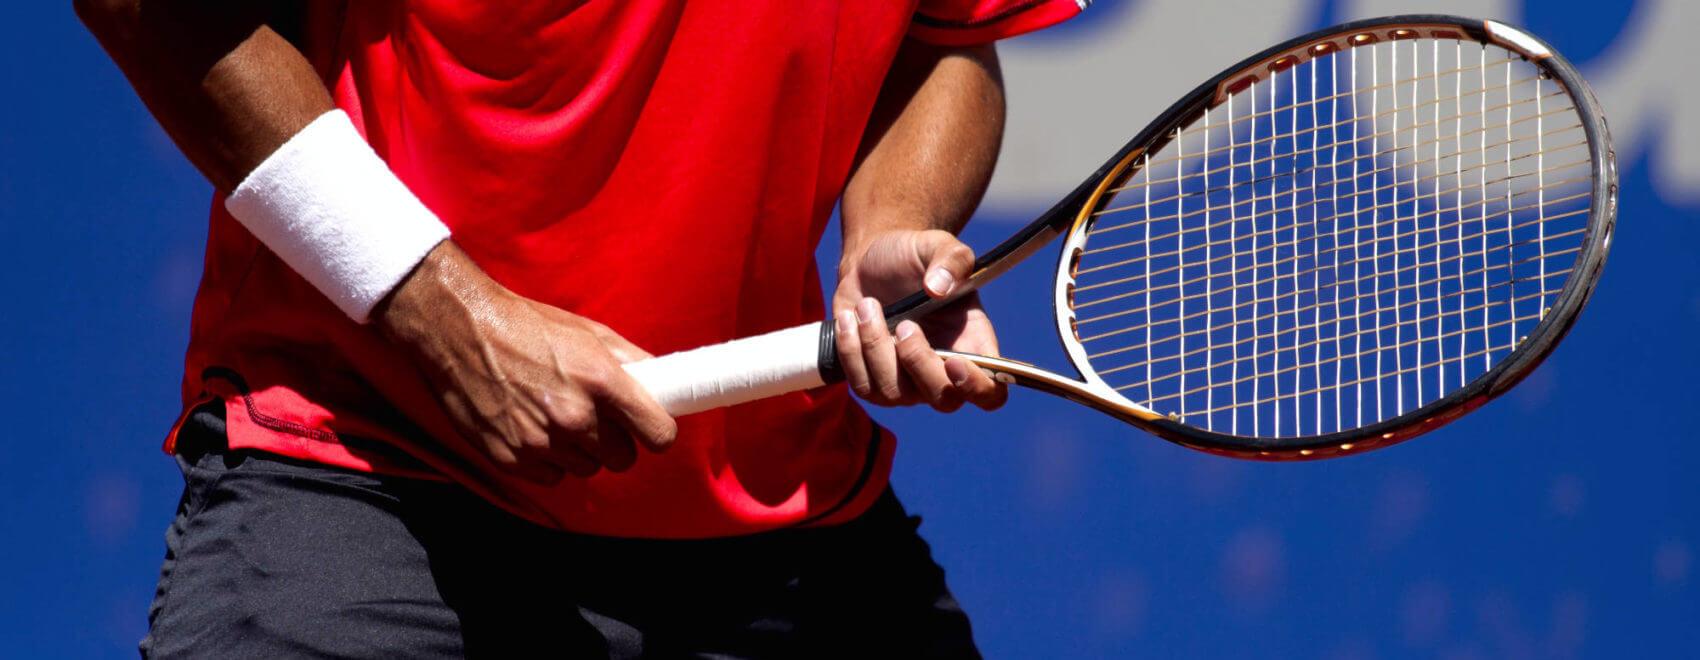 Tennis Speler